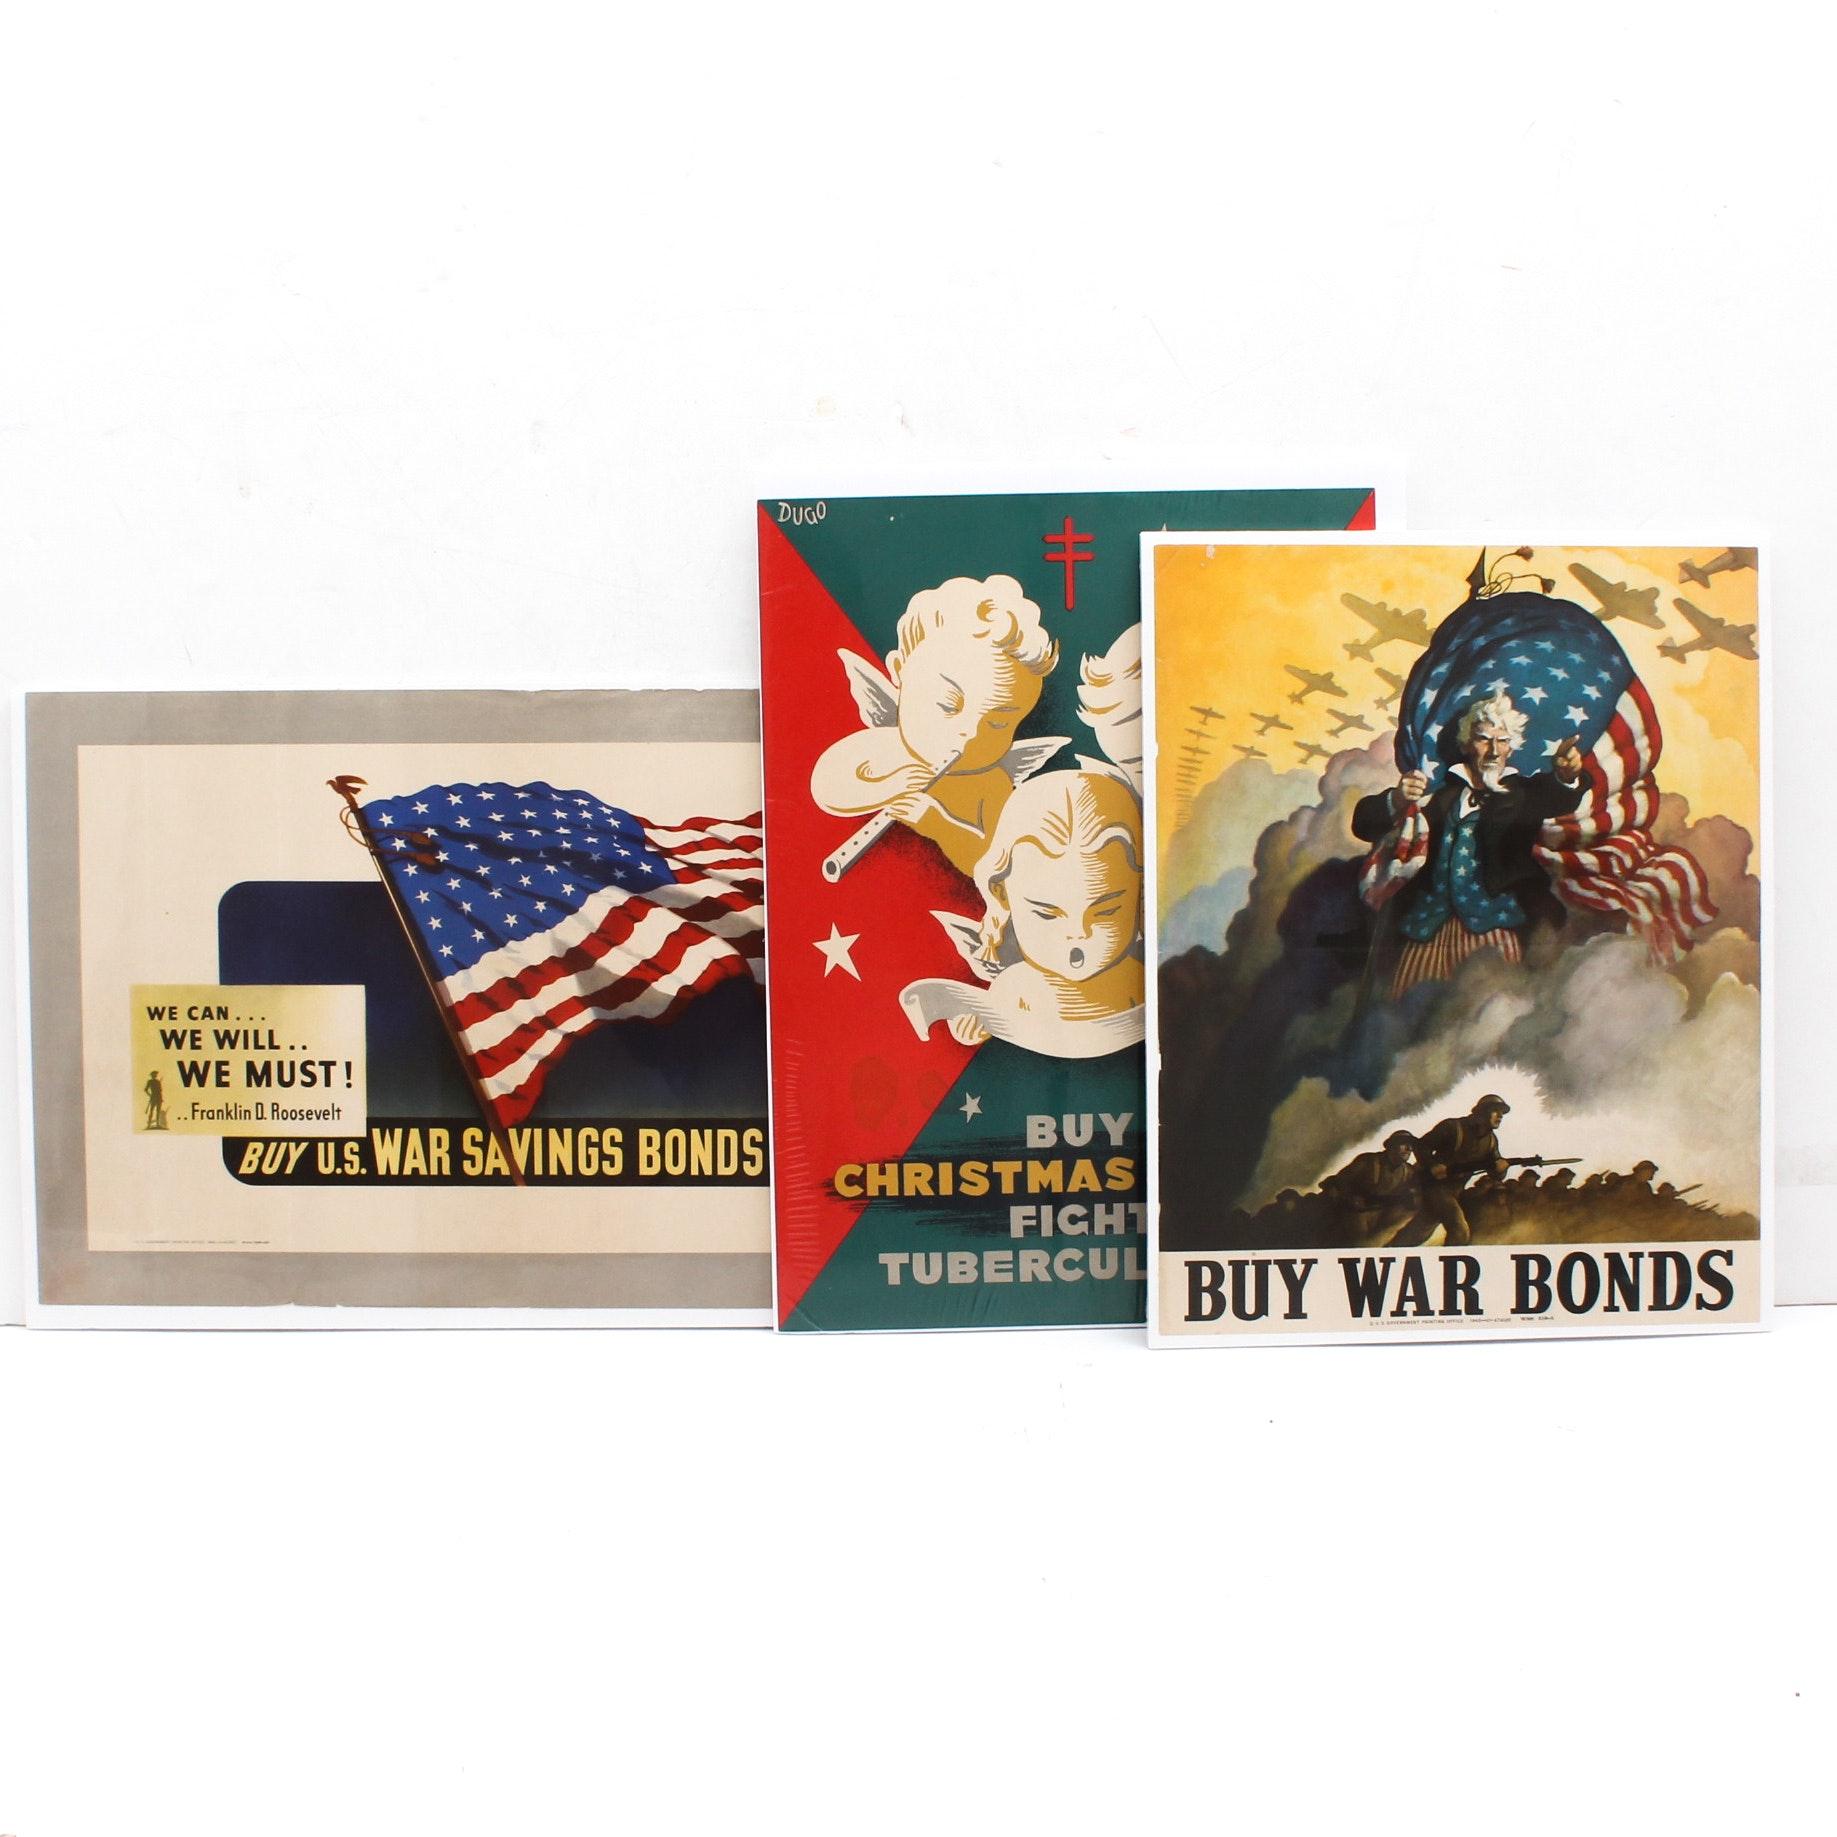 Vintage War Bond and Christmas Seal Posters